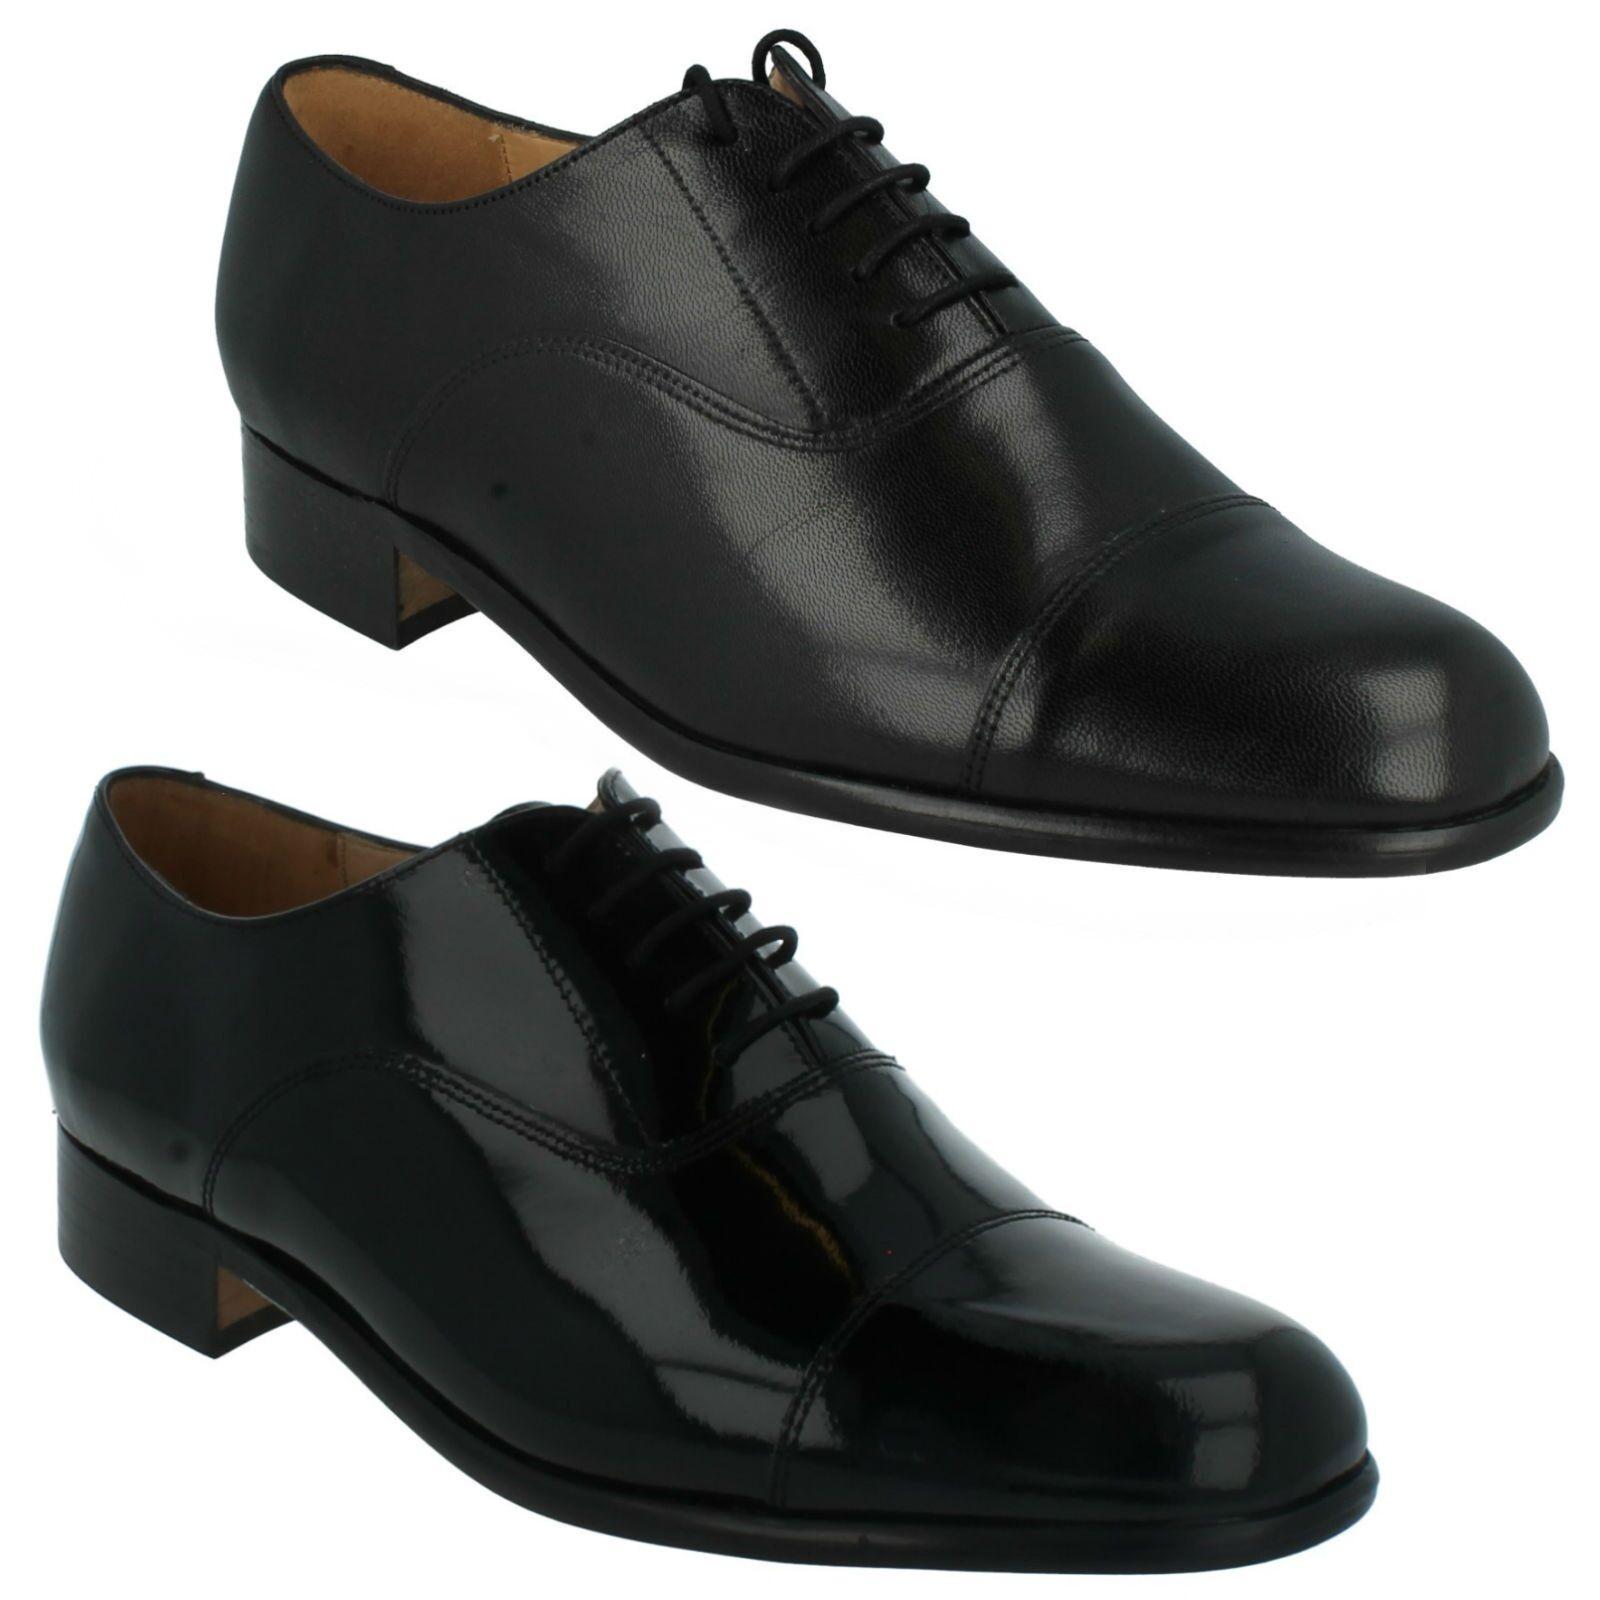 Mens Grenson Smart Formal Lace Up Work shoes Paddington Black Leather Patent